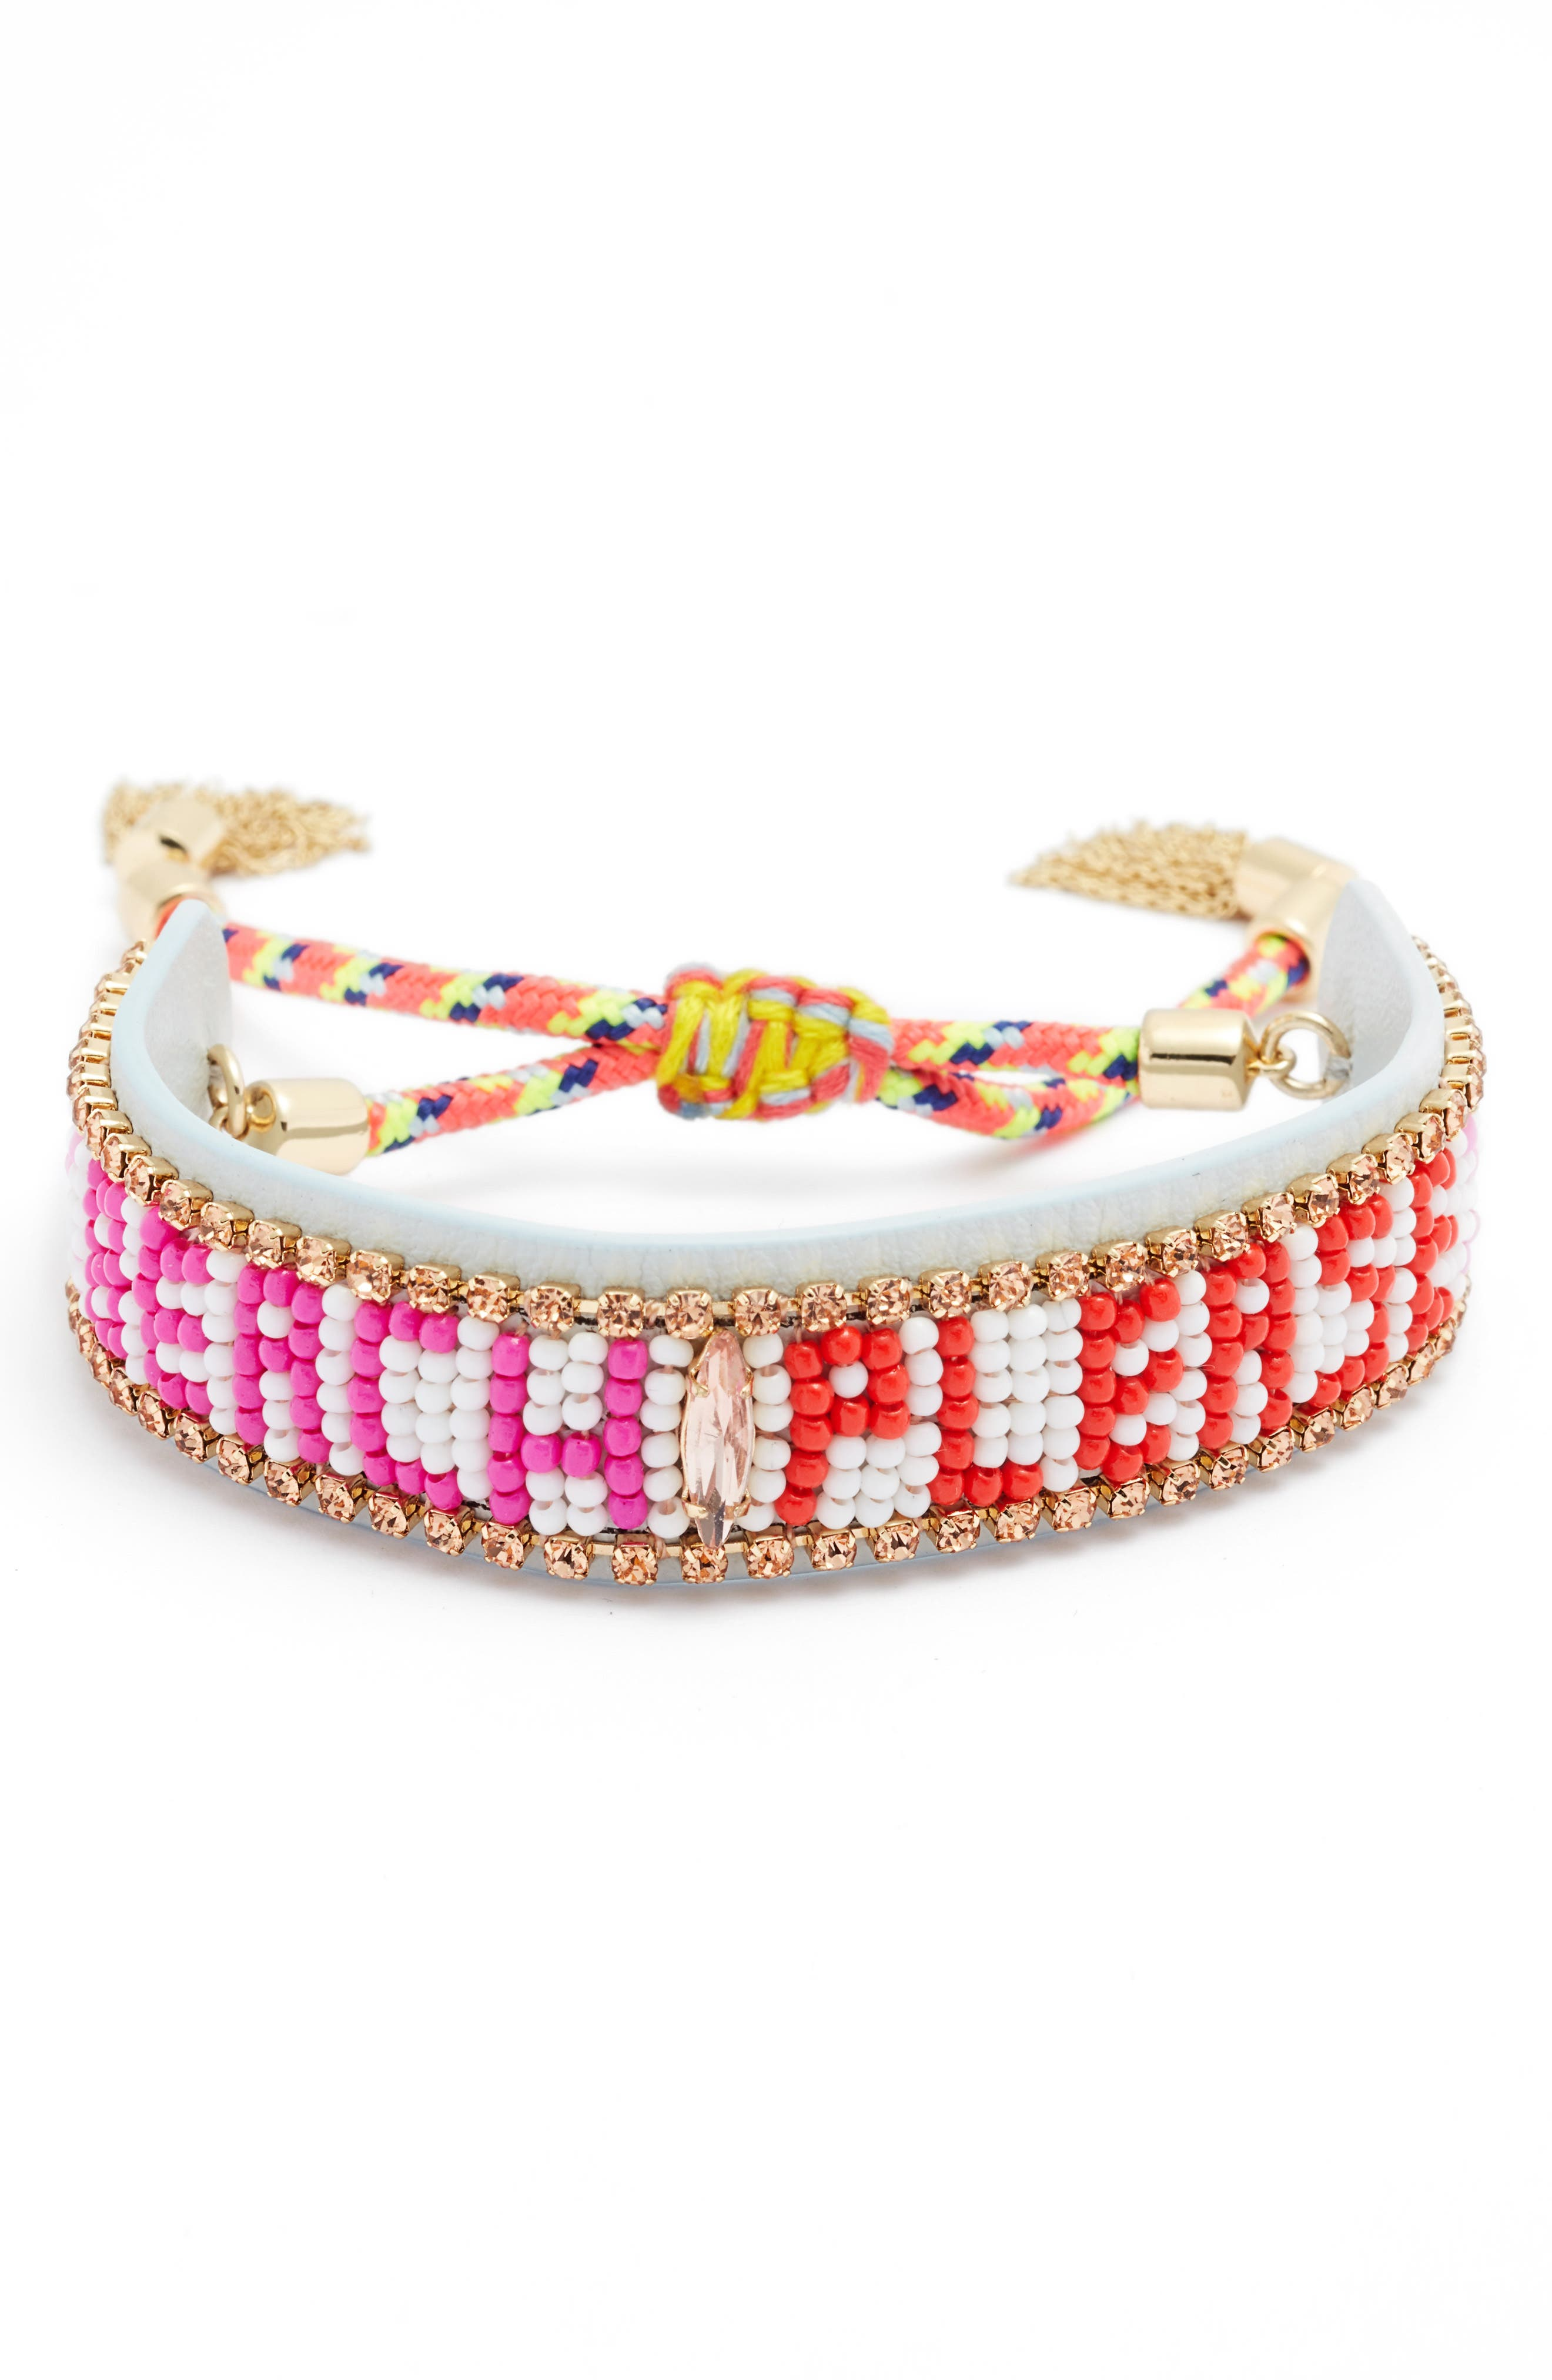 Alternate Image 1 Selected - Rebecca Minkoff Beach Please Seed Bead Bracelet